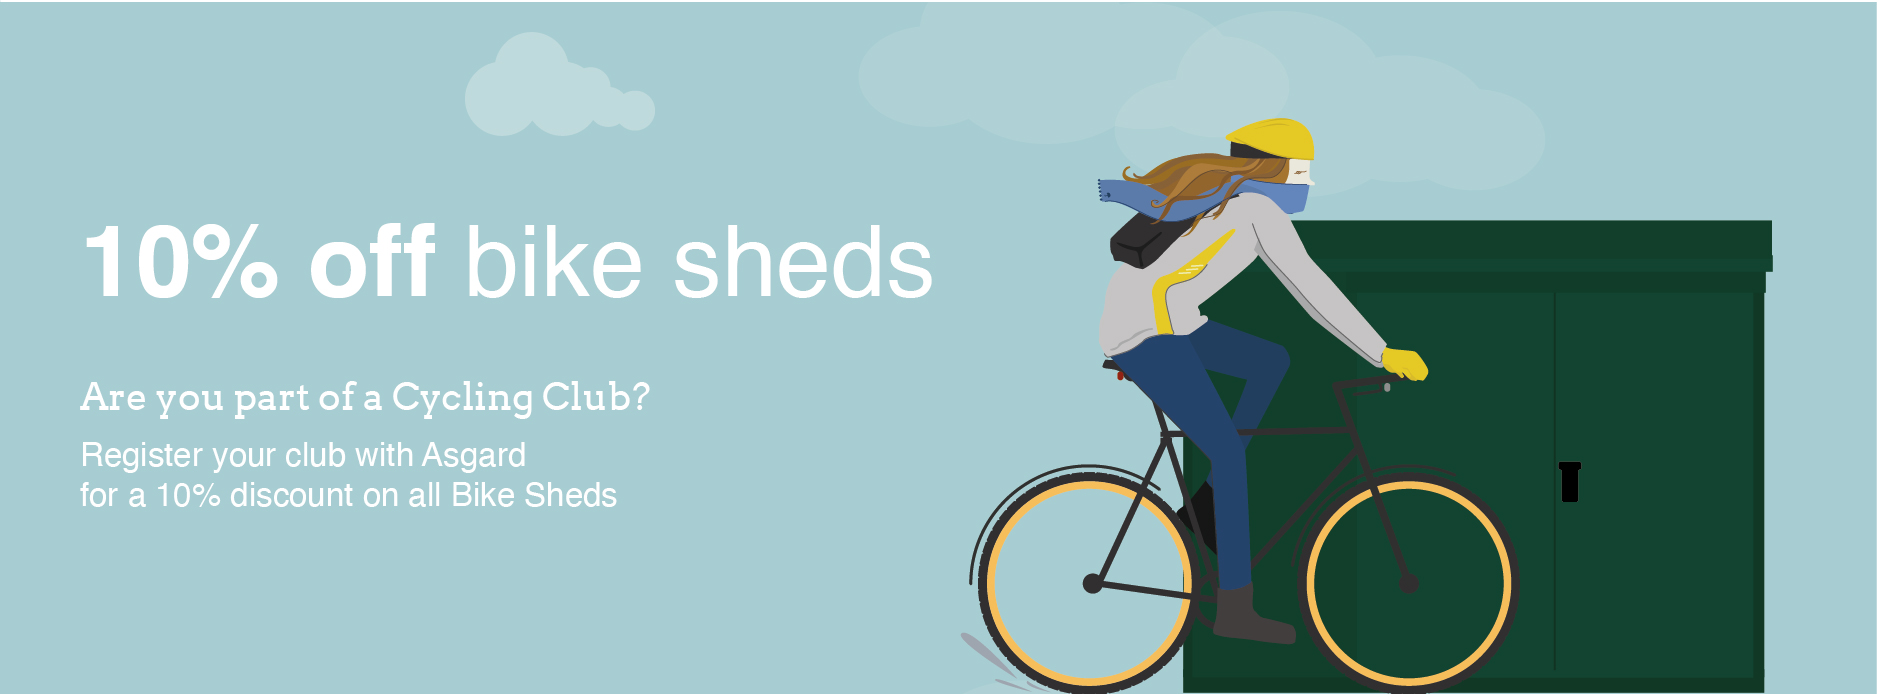 Cycling Club Bike Storage Discounts